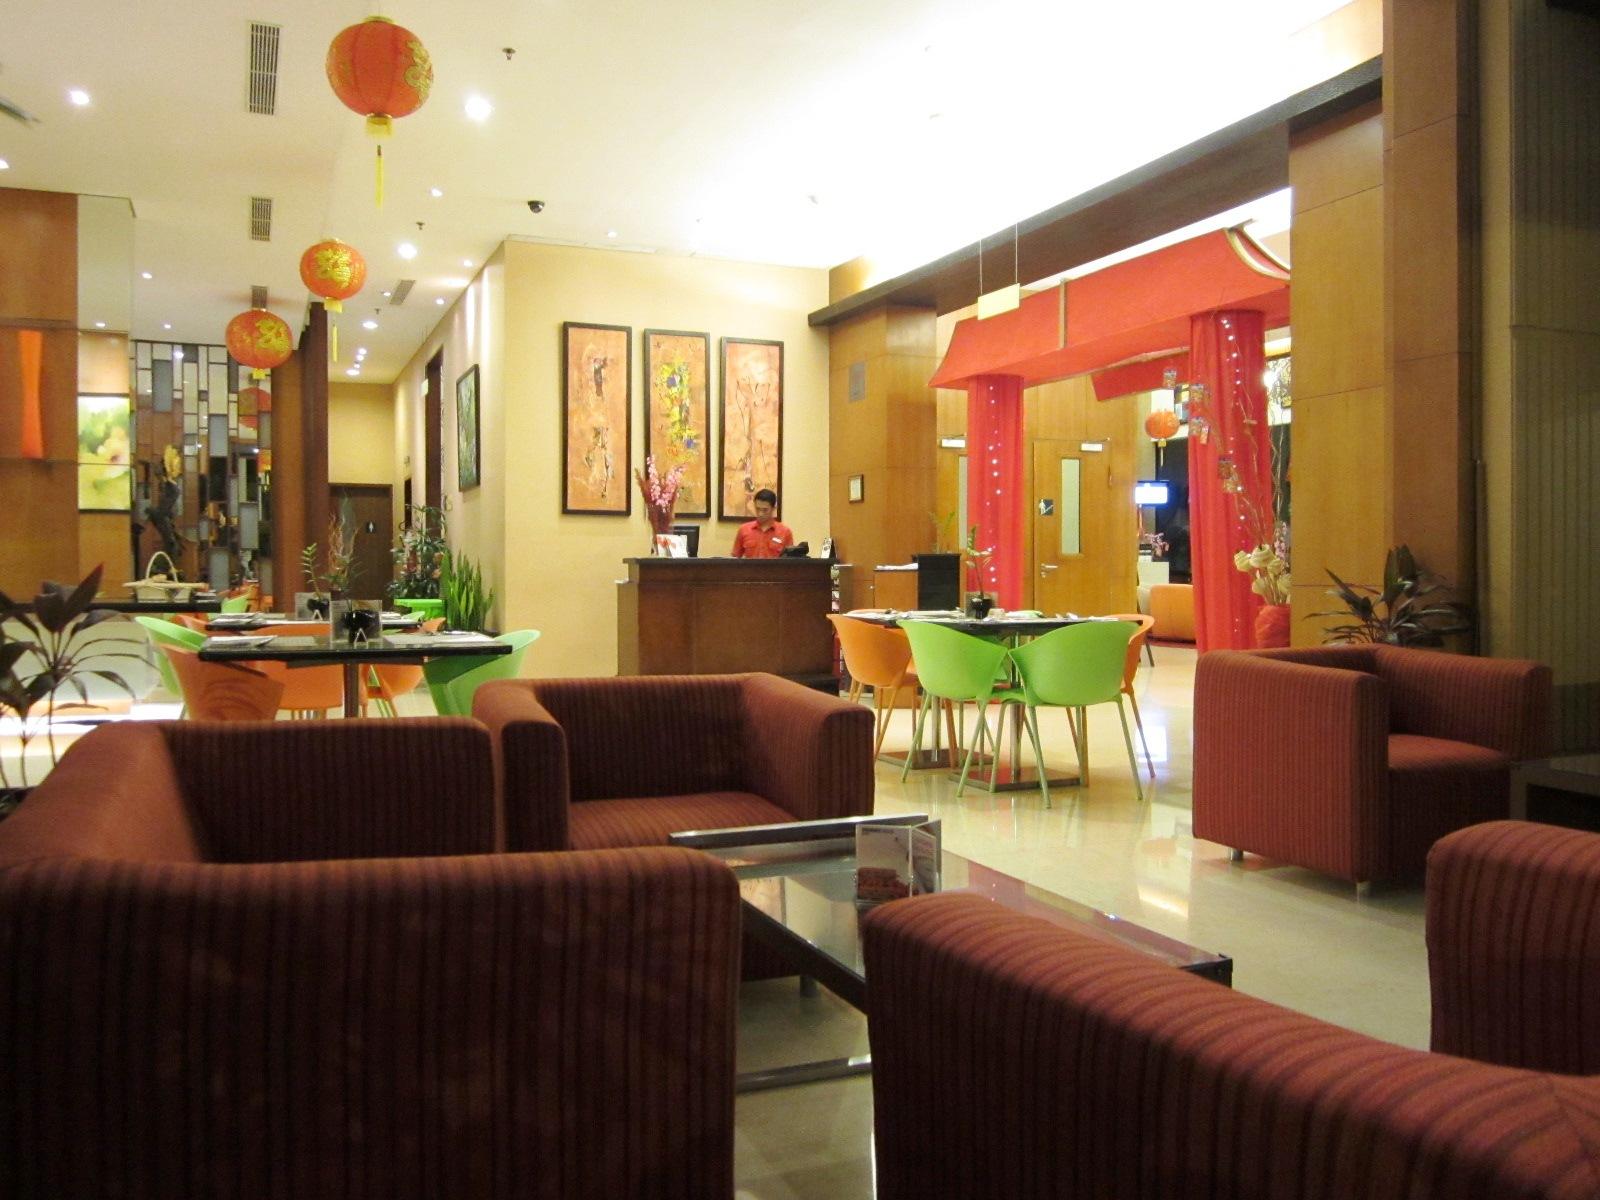 Adeknakemal Jalan2 Makan2 D Kuliner La Table